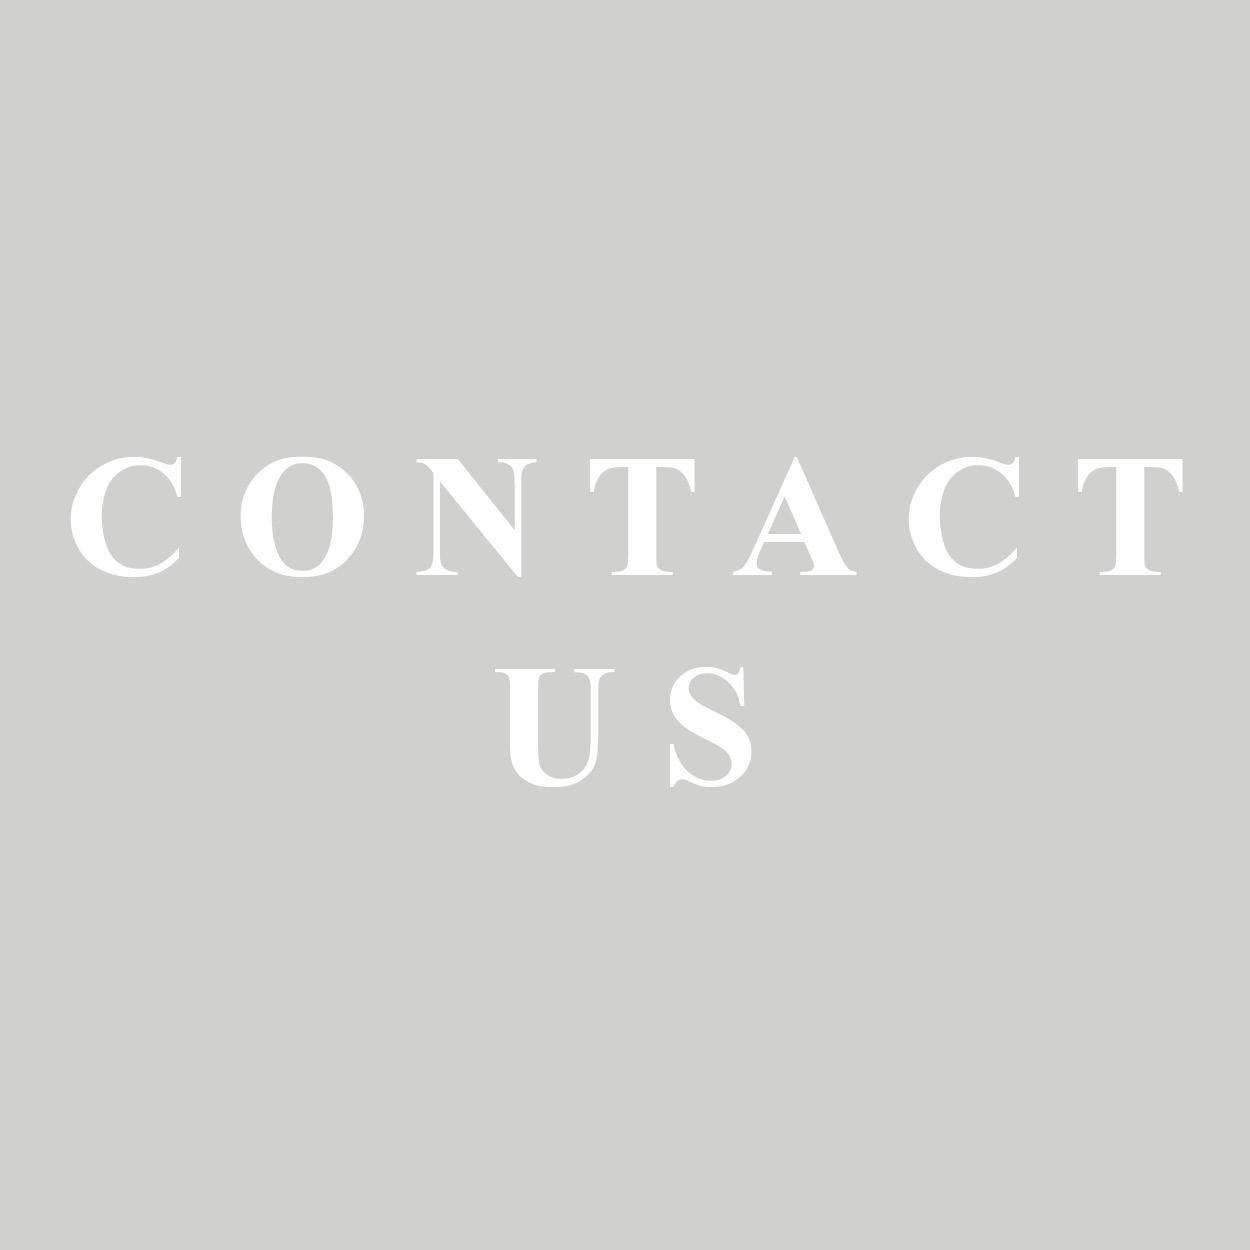 Contact Us - Enhancements